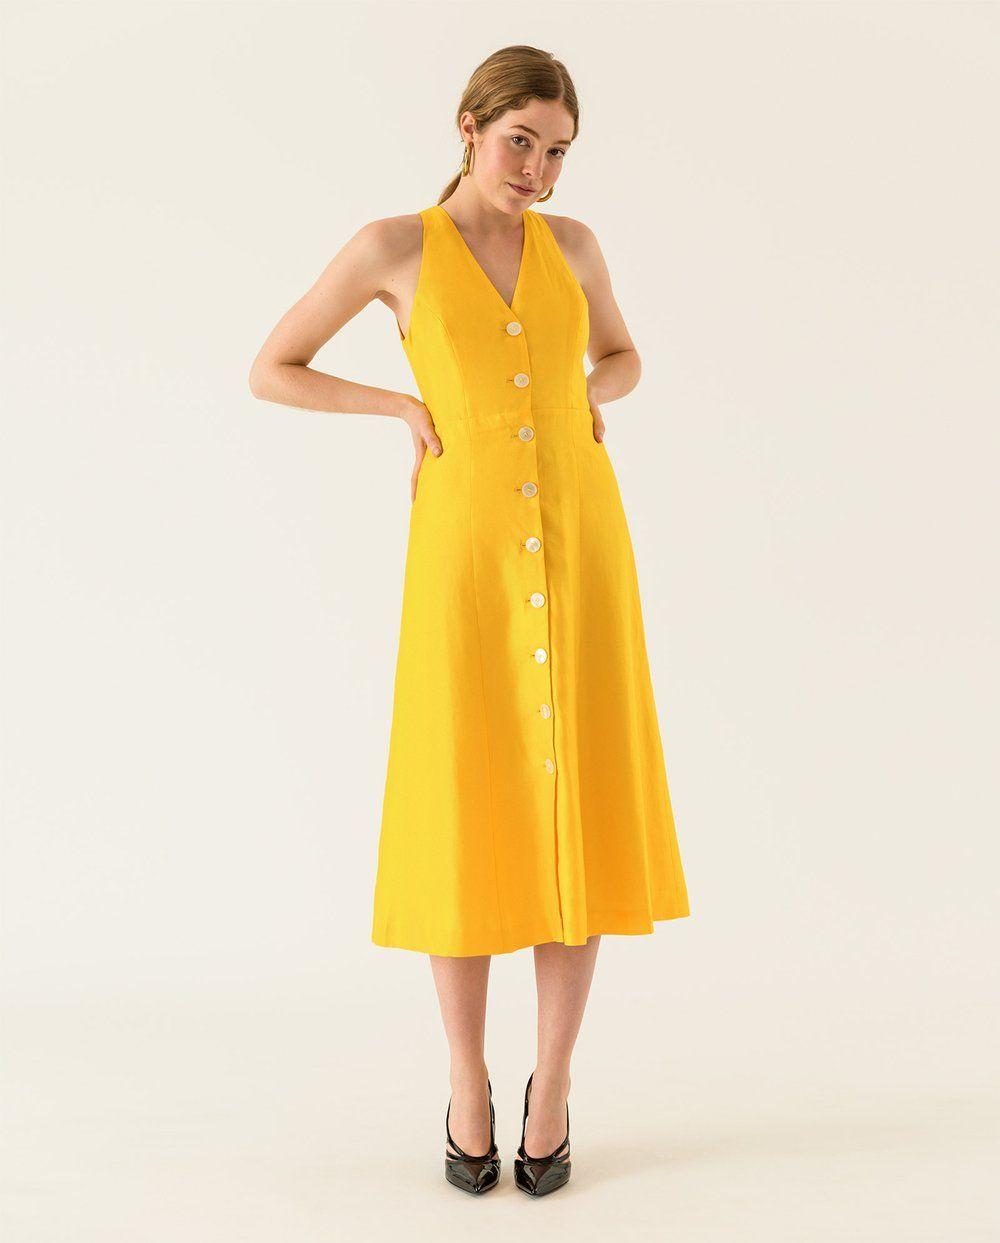 Armelloses Midi Kleid Mit Durchgehender Knopfleiste Vorne Kleid Mit Knopfleiste Kleider Knopf